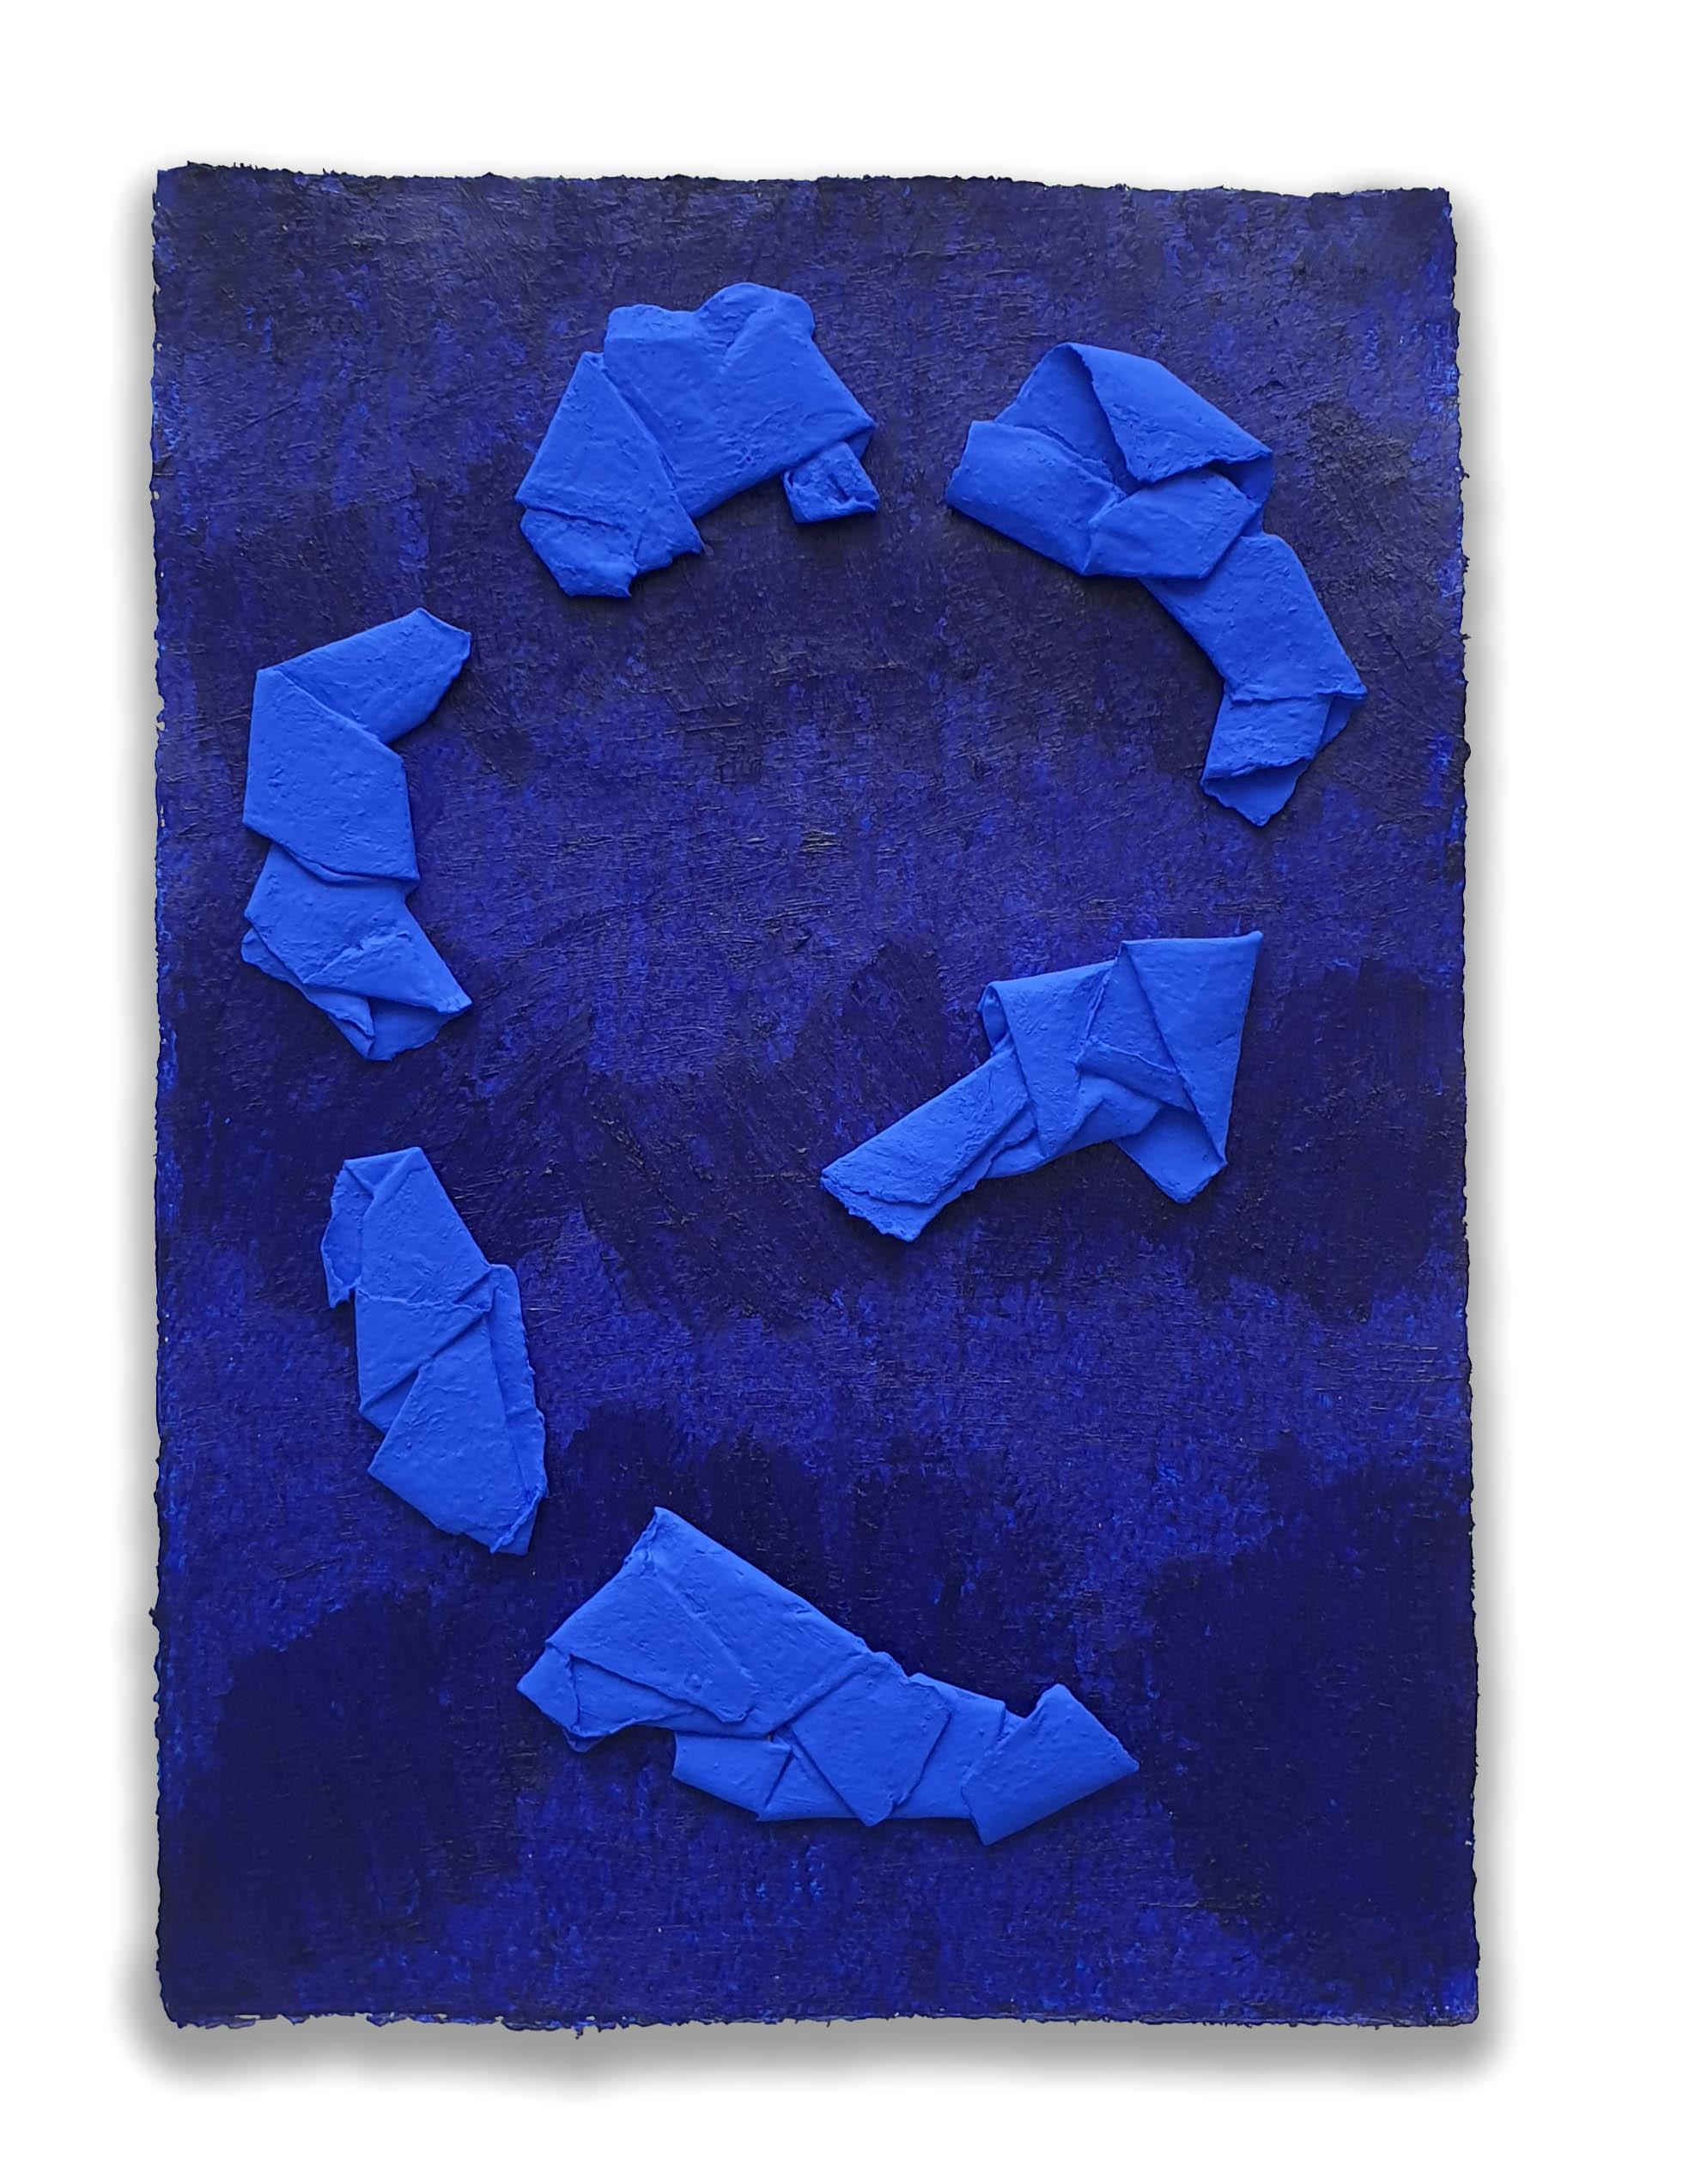 Ultramarine Vortex  - 2019  Acrylic pigment and oil stick on paper  43 x 30 cm